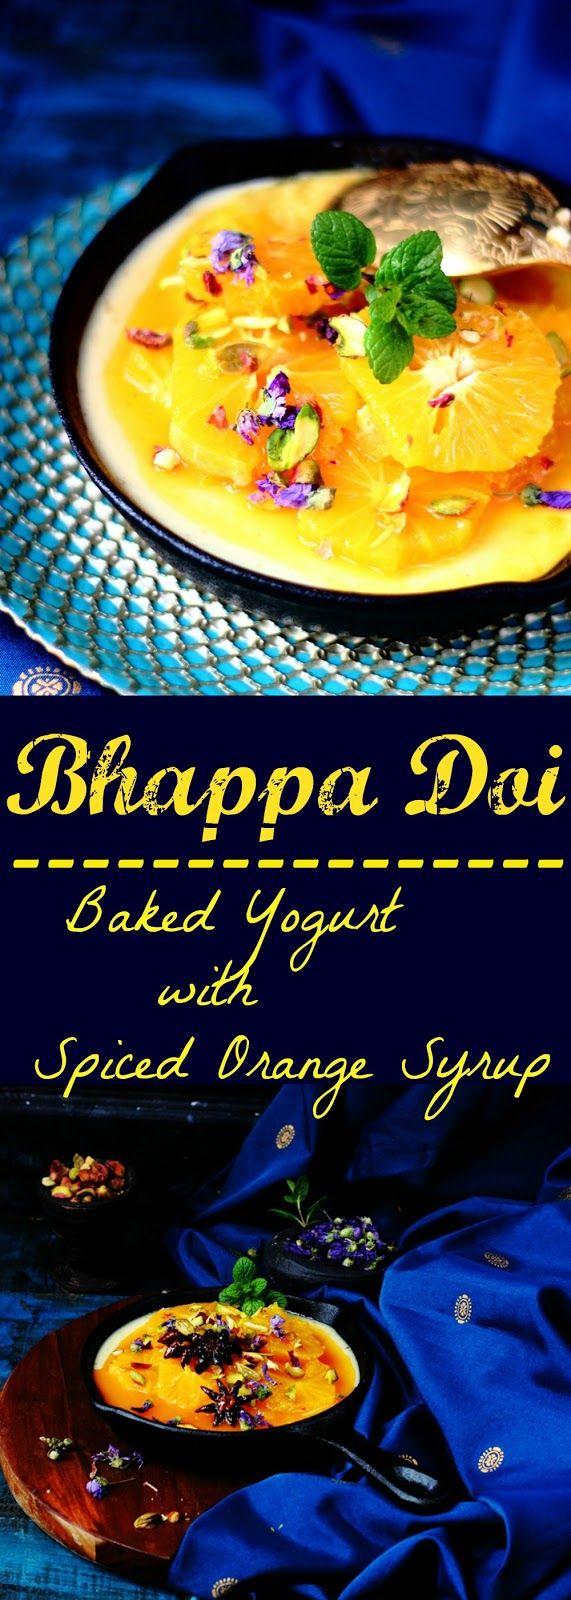 Jagruti's Cooking Odyssey: Bhappa Doi ( Baked Yogurt ) with Spiced Orange Syrup